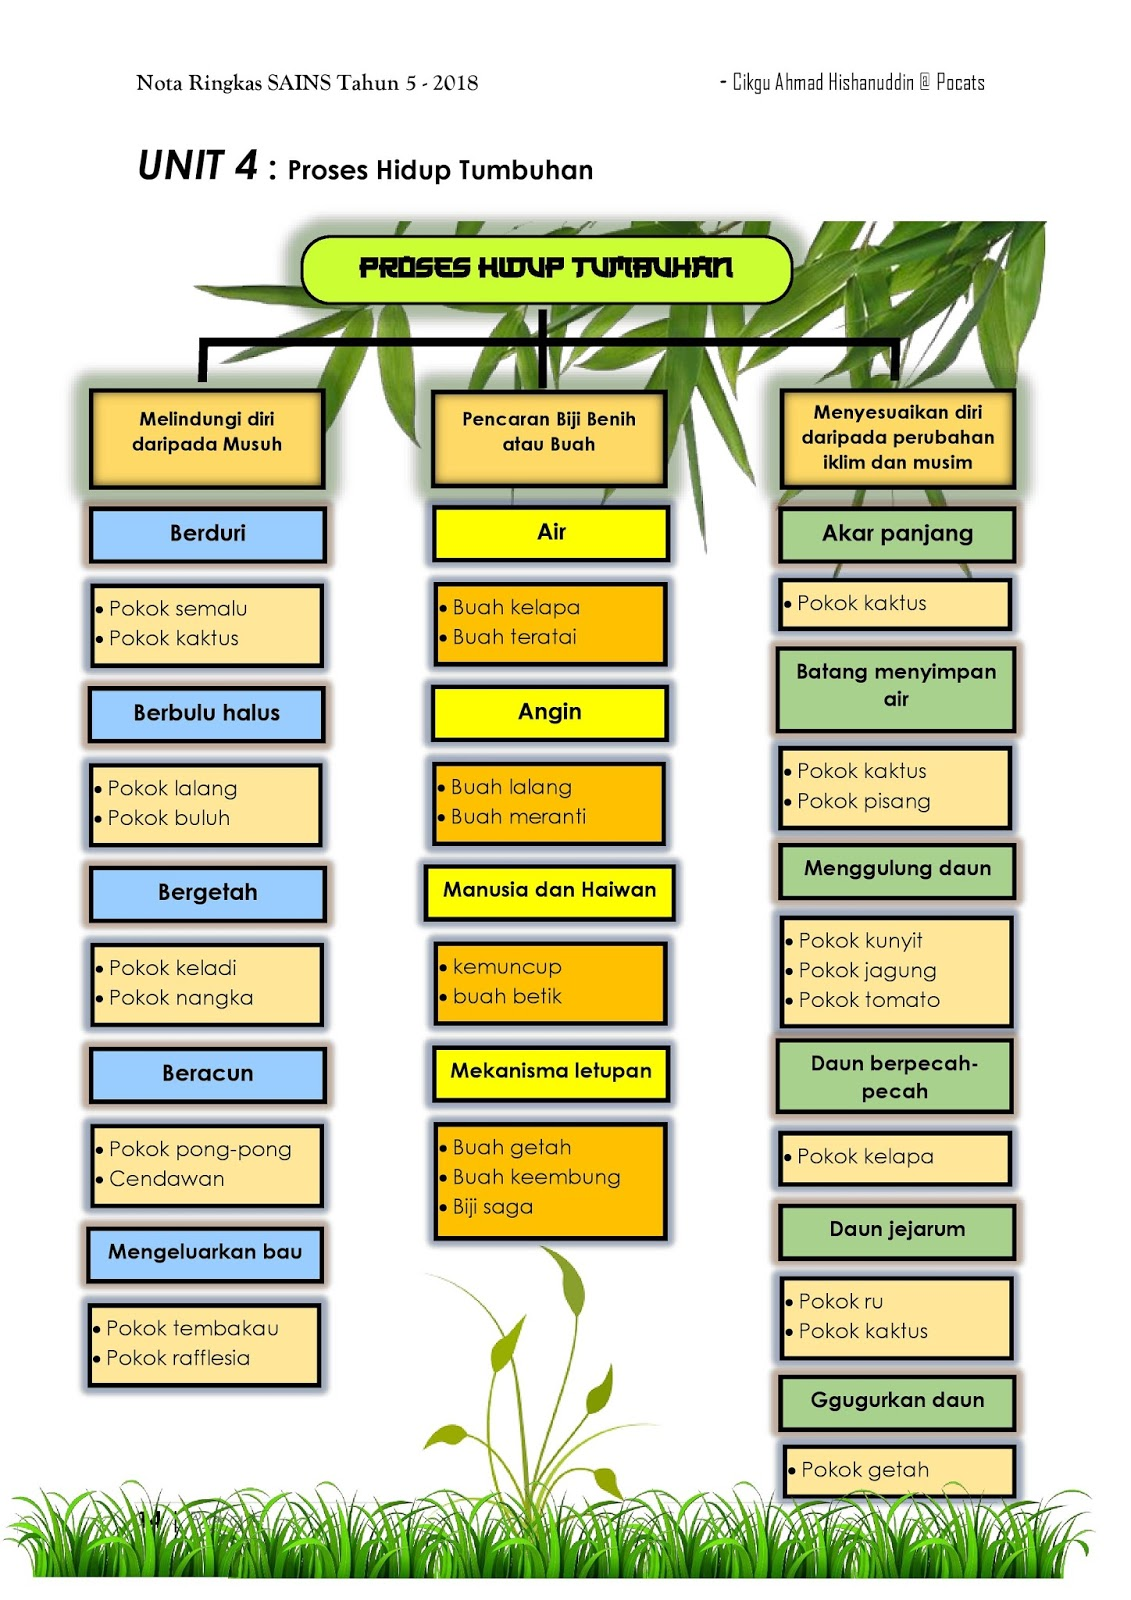 Notasains T5 Proses Hidup Tumbuhan